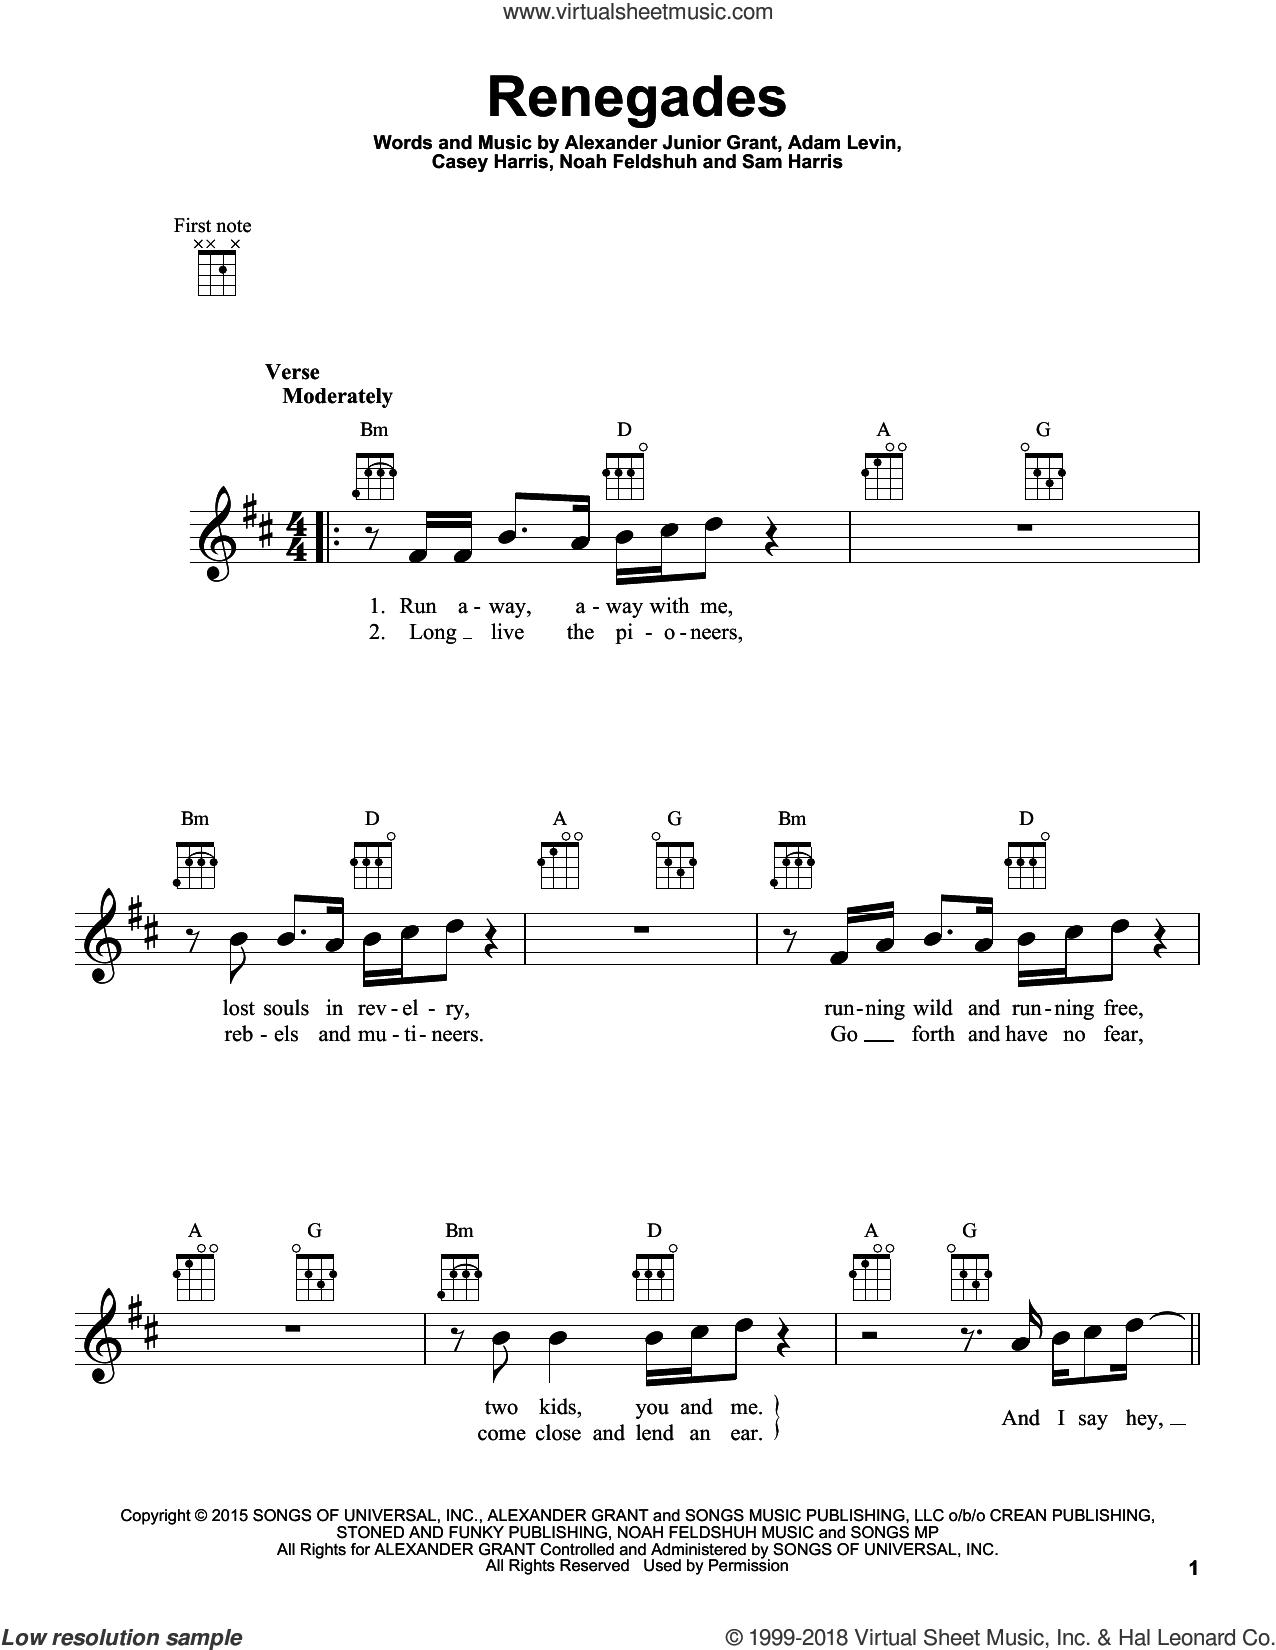 Renegades sheet music for ukulele by X Ambassadors, Adam Levin, Alexander Junior Grant, Casey Harris, Noah Feldshuh and Samuel Harris, intermediate skill level